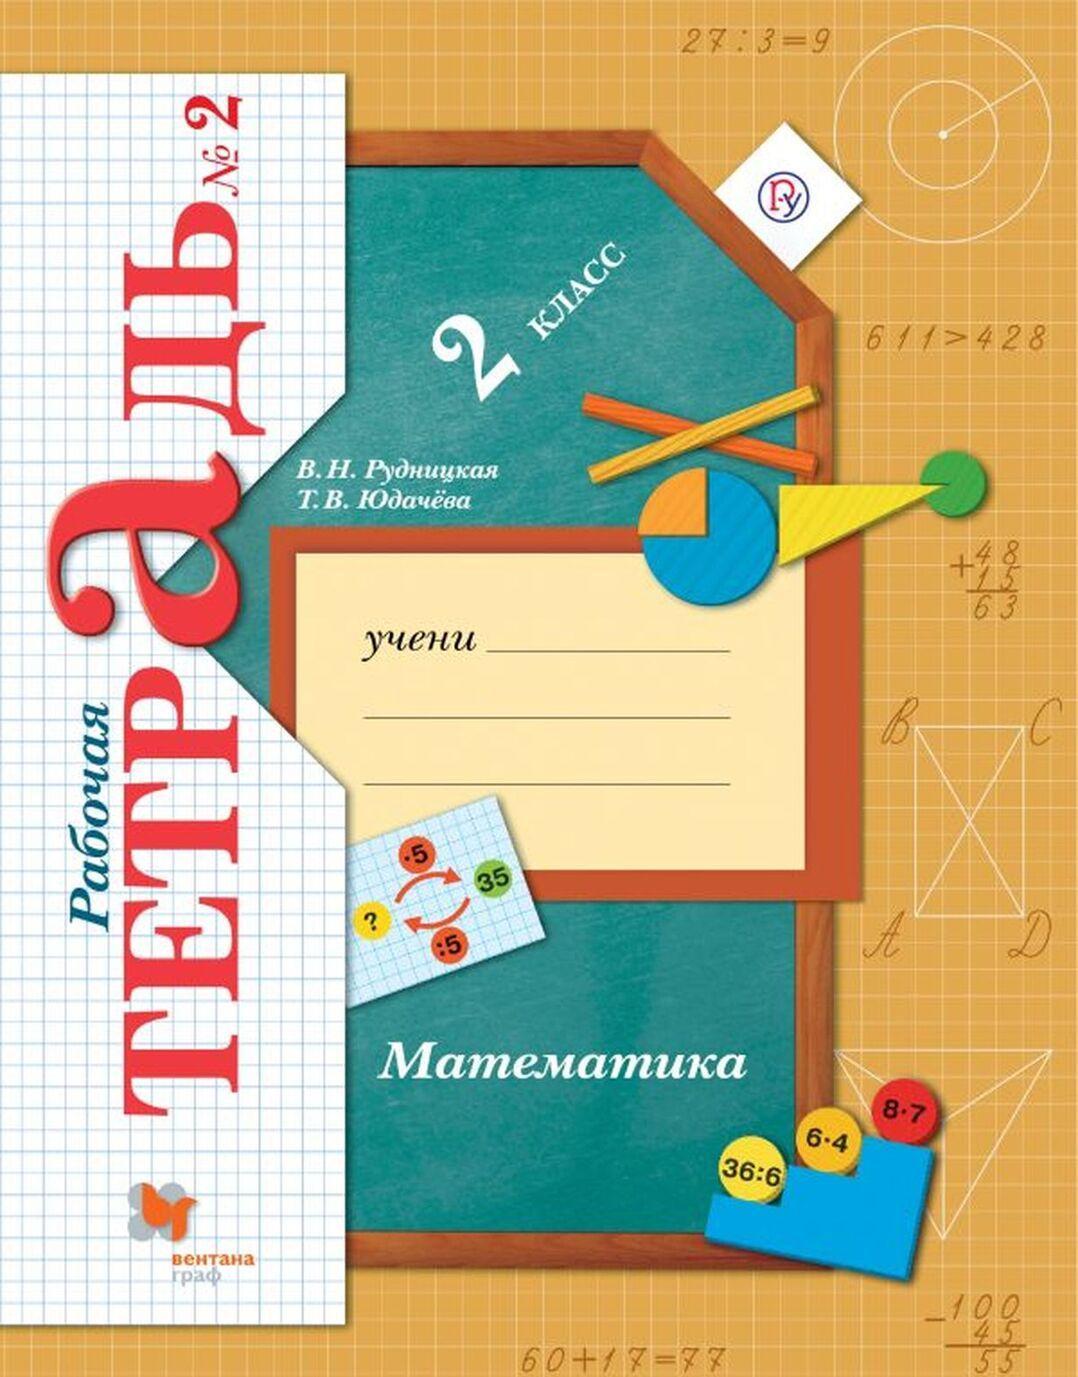 Matematika. 2 klass. Rabochaja tetrad. V 2-kh chastjakh. Chast 2 | Rudnitskaja Viktorija Naumovna, Judacheva Tatjana Vladimirovna